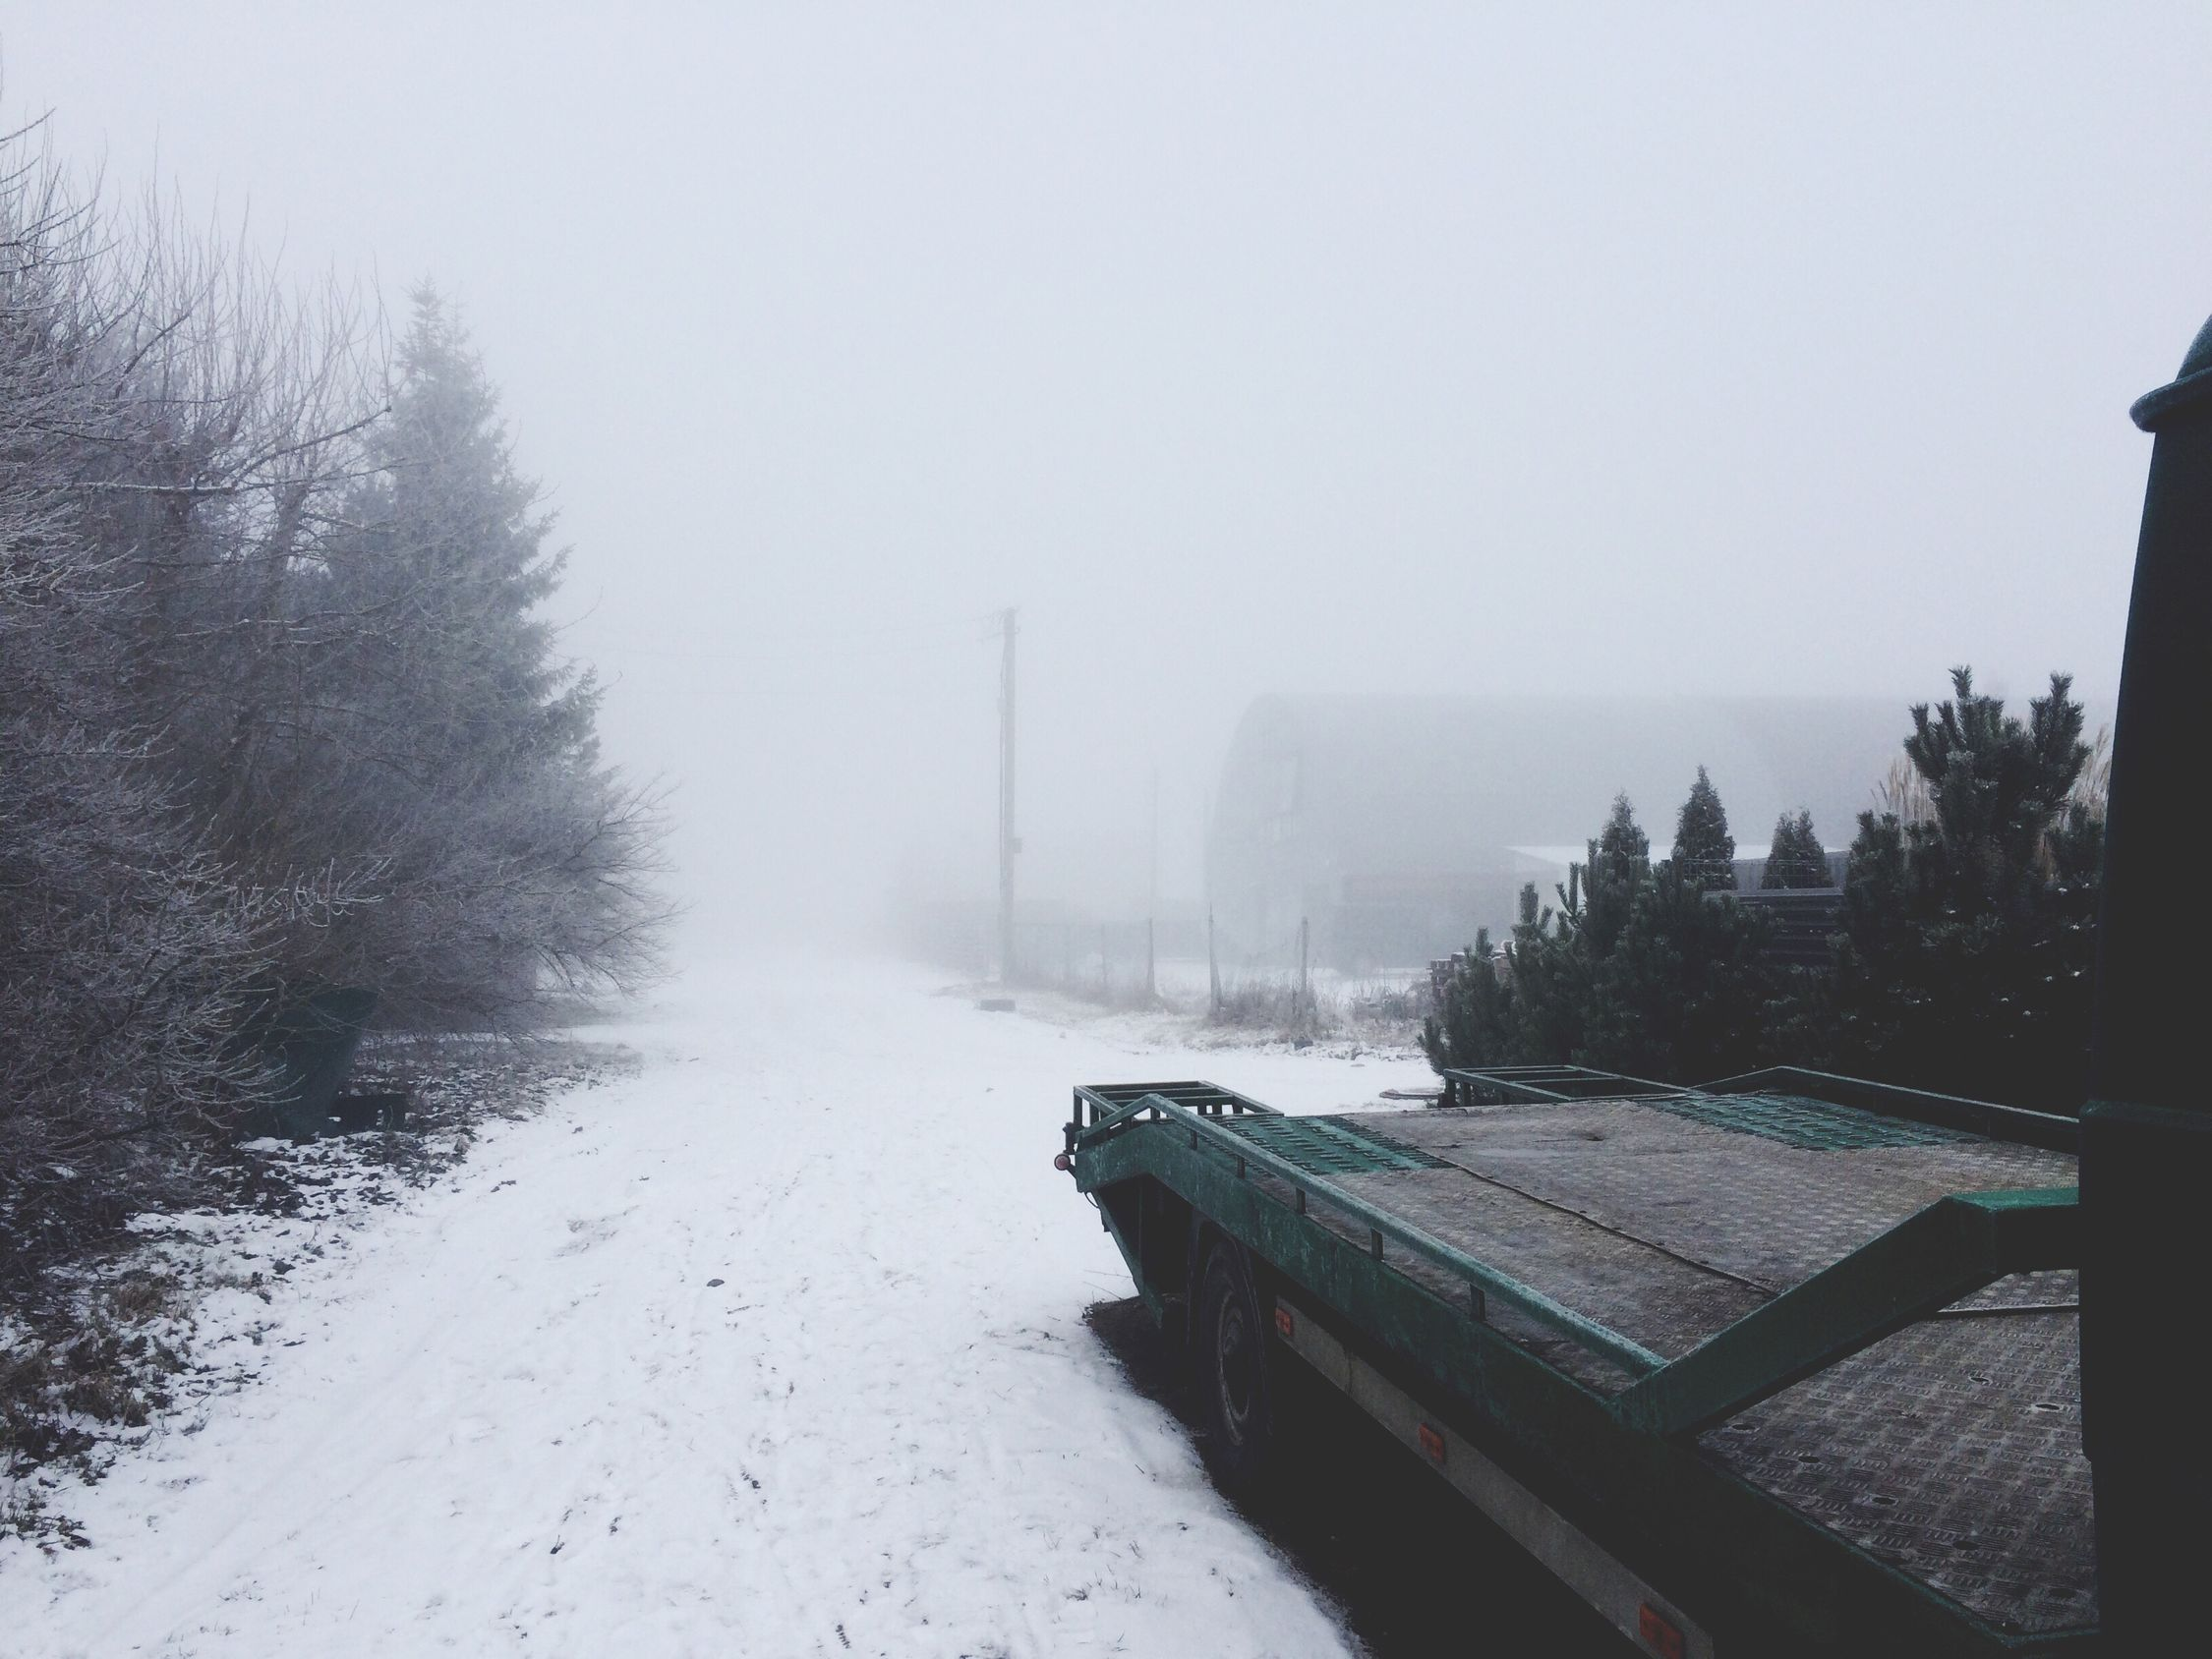 Winter ending fog Lastdayofwinter Firstdayofspring Trail Van First Eyeem Photo